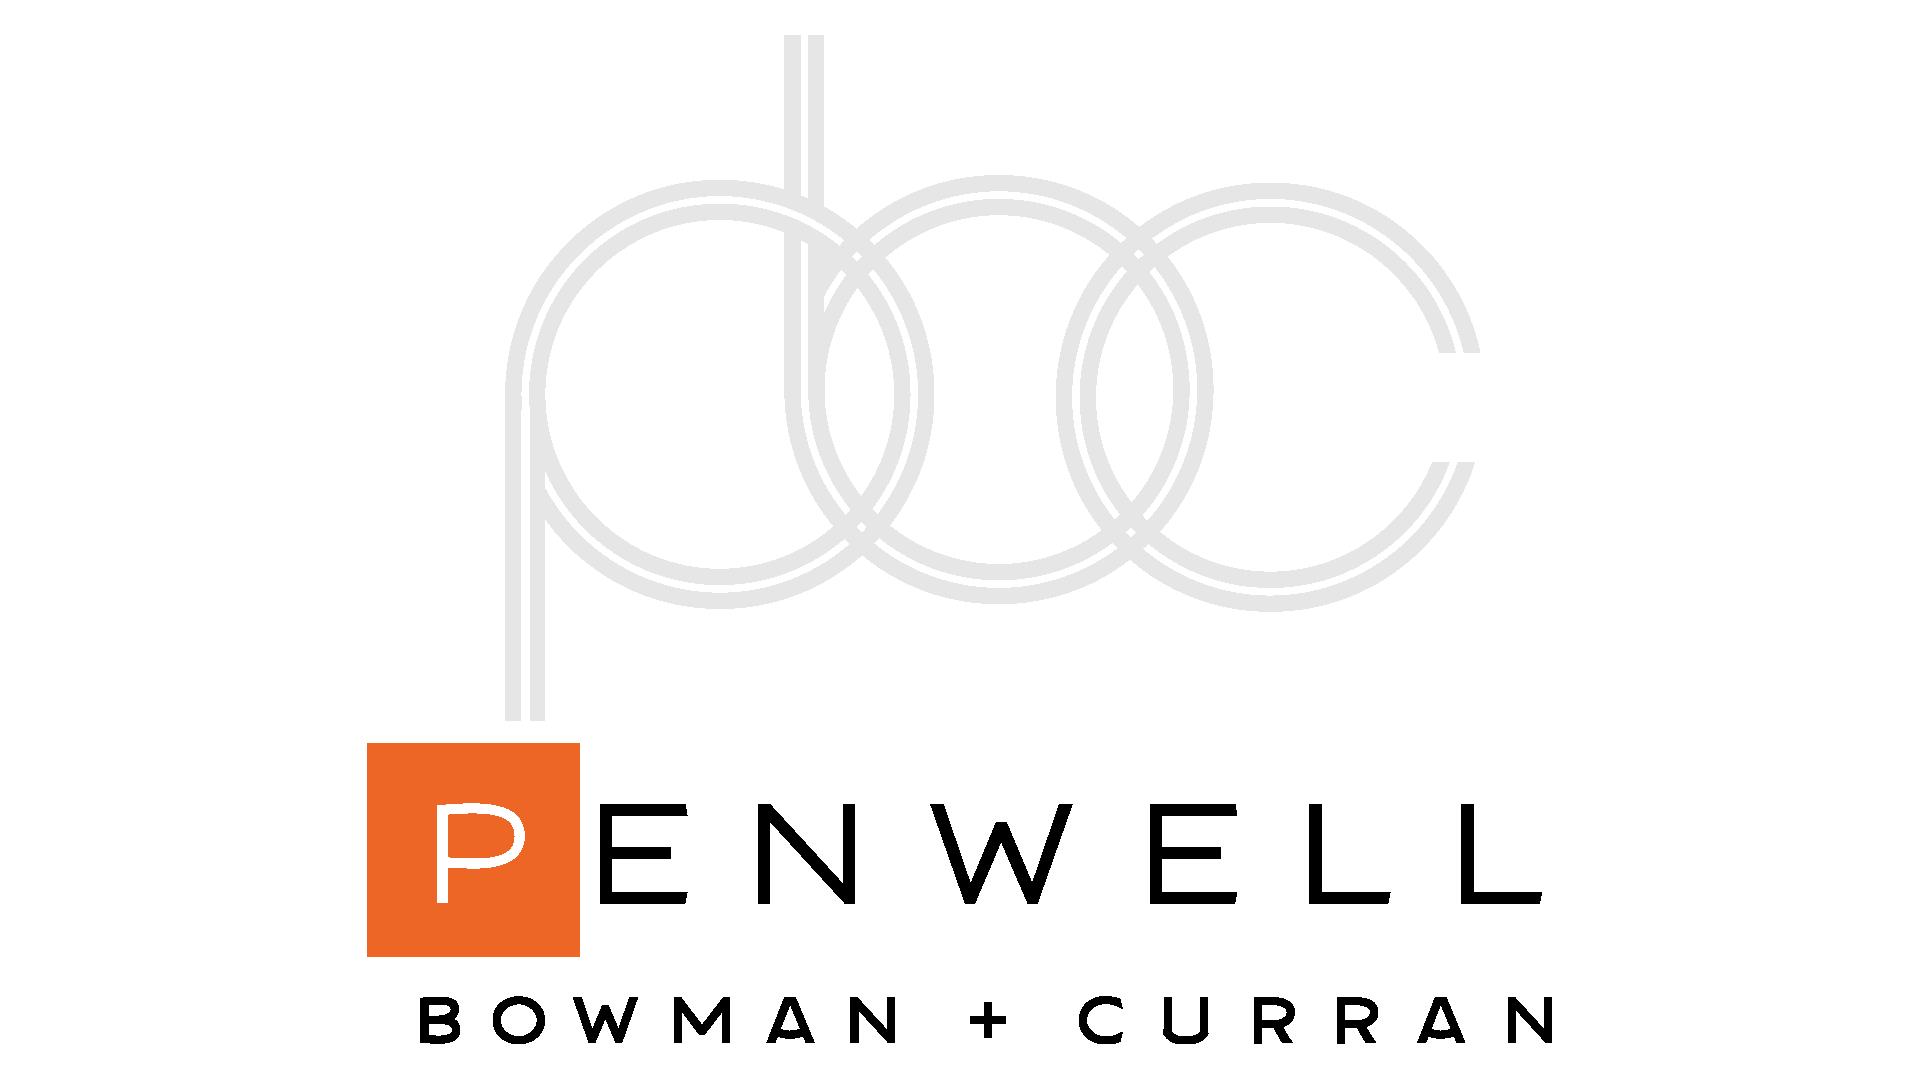 Penwell Bowman + Curran logo